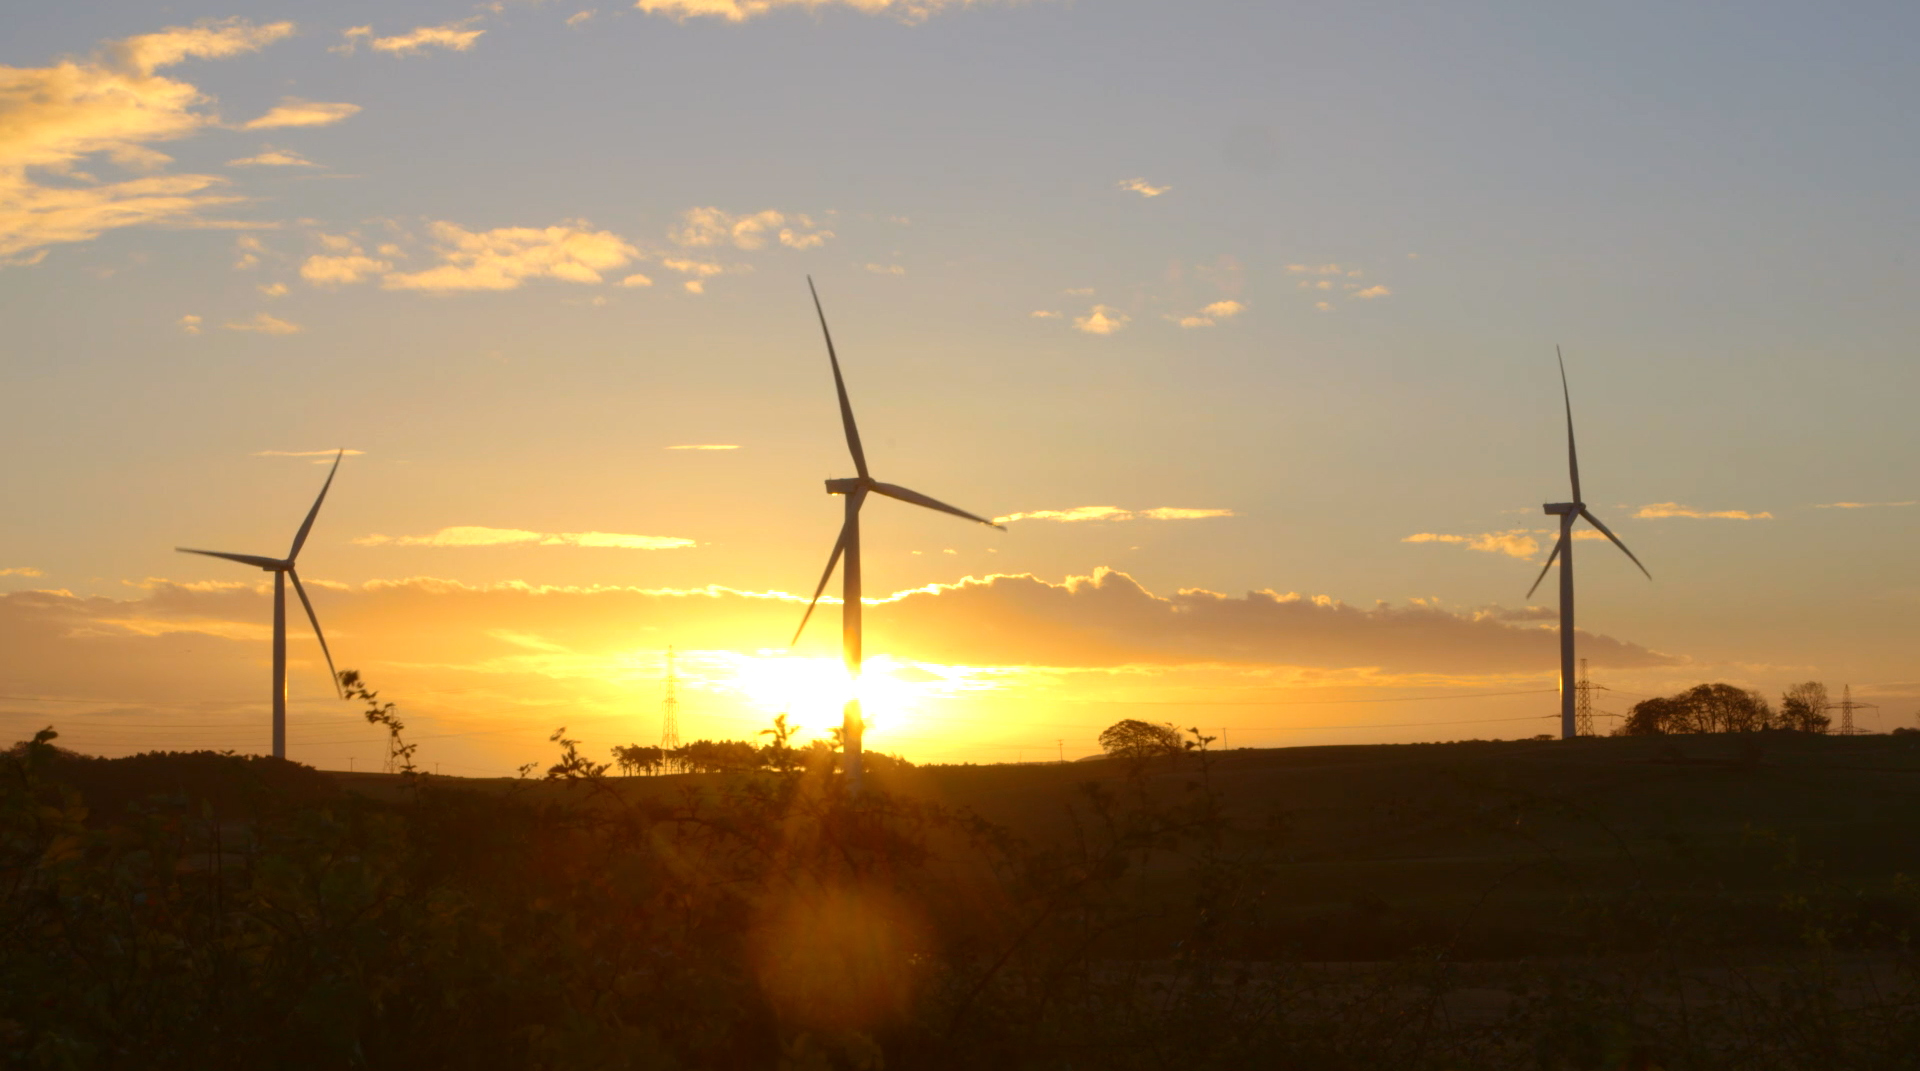 GE's Little Raith Wind Farm in Fife, Scotland